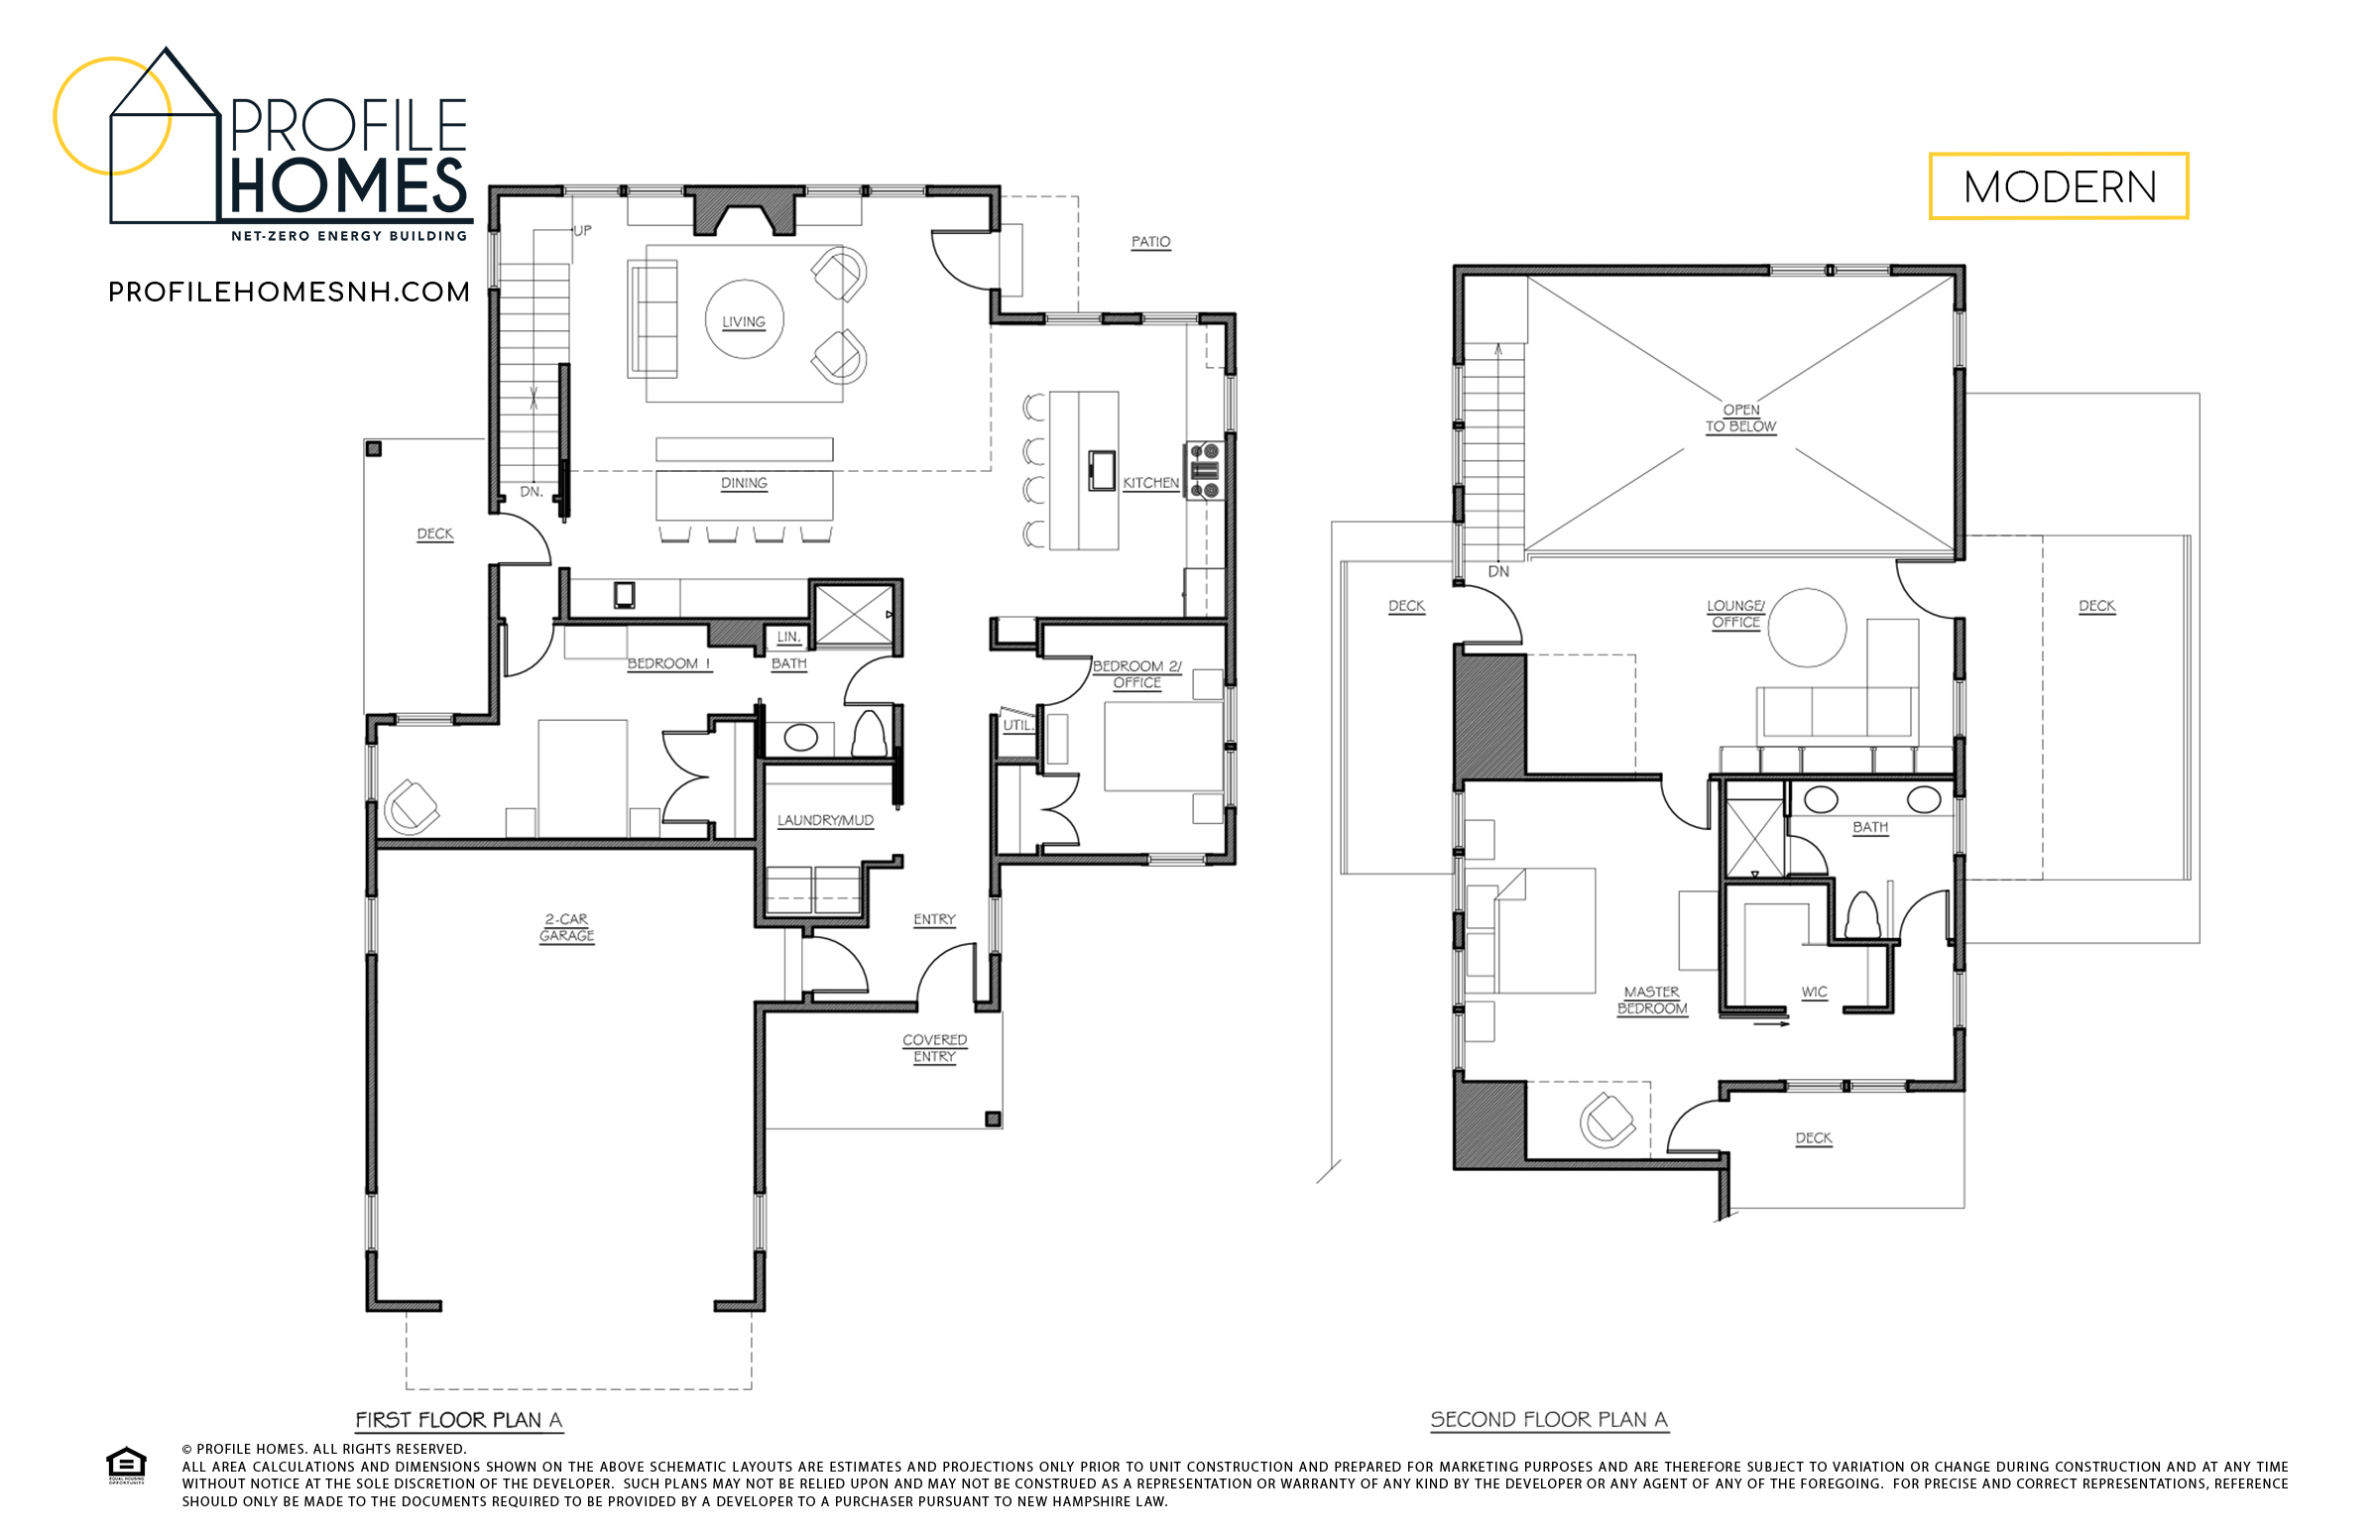 Profile Homes Floorplan Modern © 2018 Profile Homes